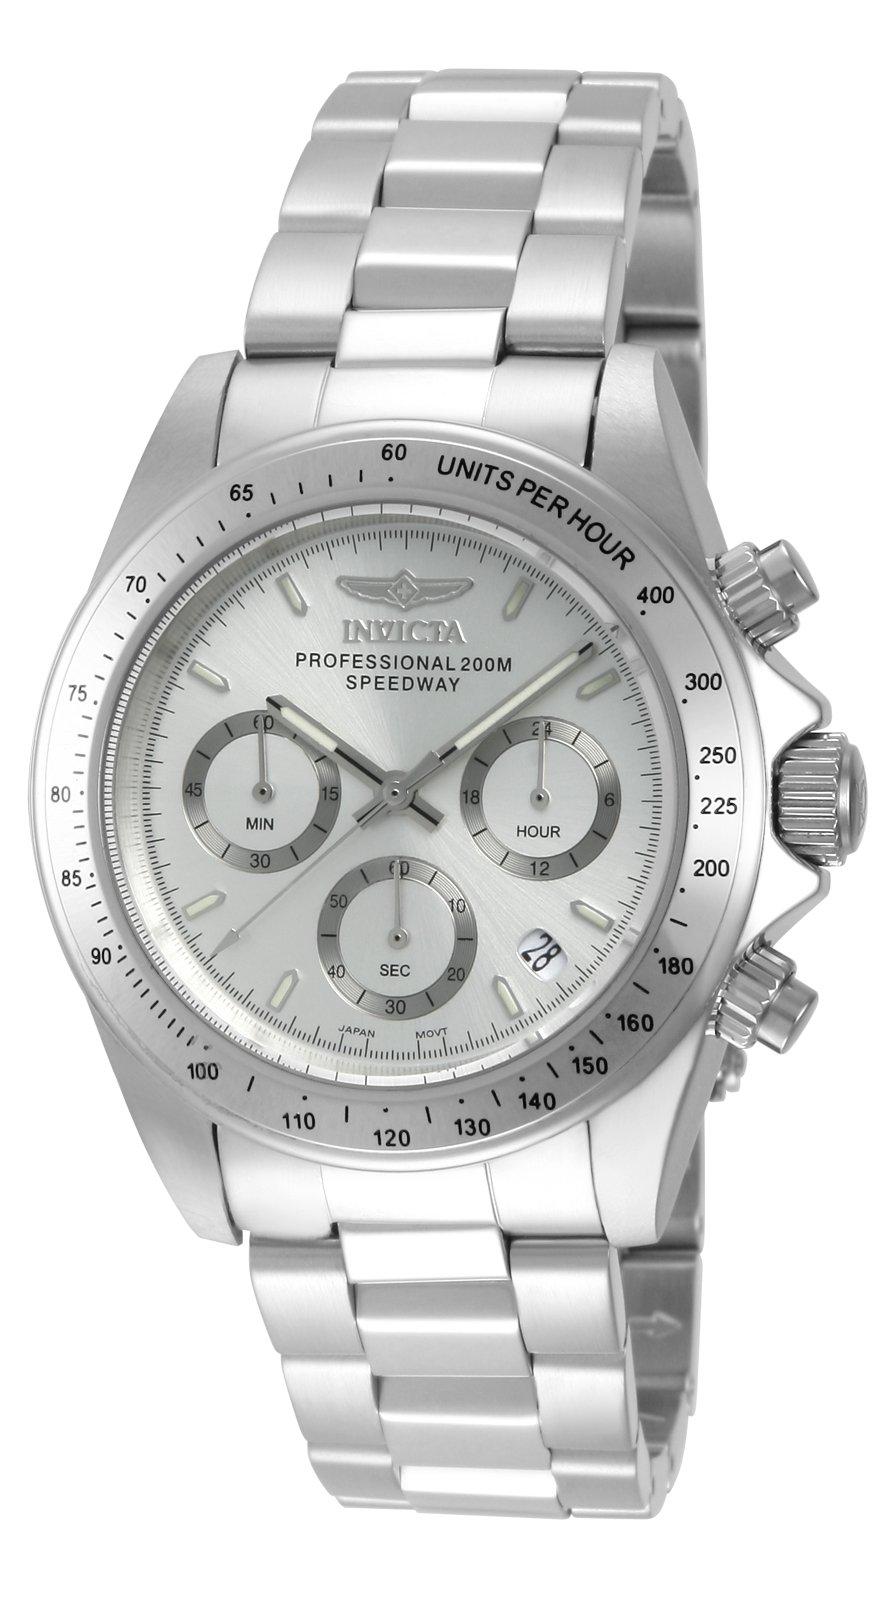 Invicta 14381 Speedway Reloj Unisex acero inoxidable Cuarzo Esfera plata